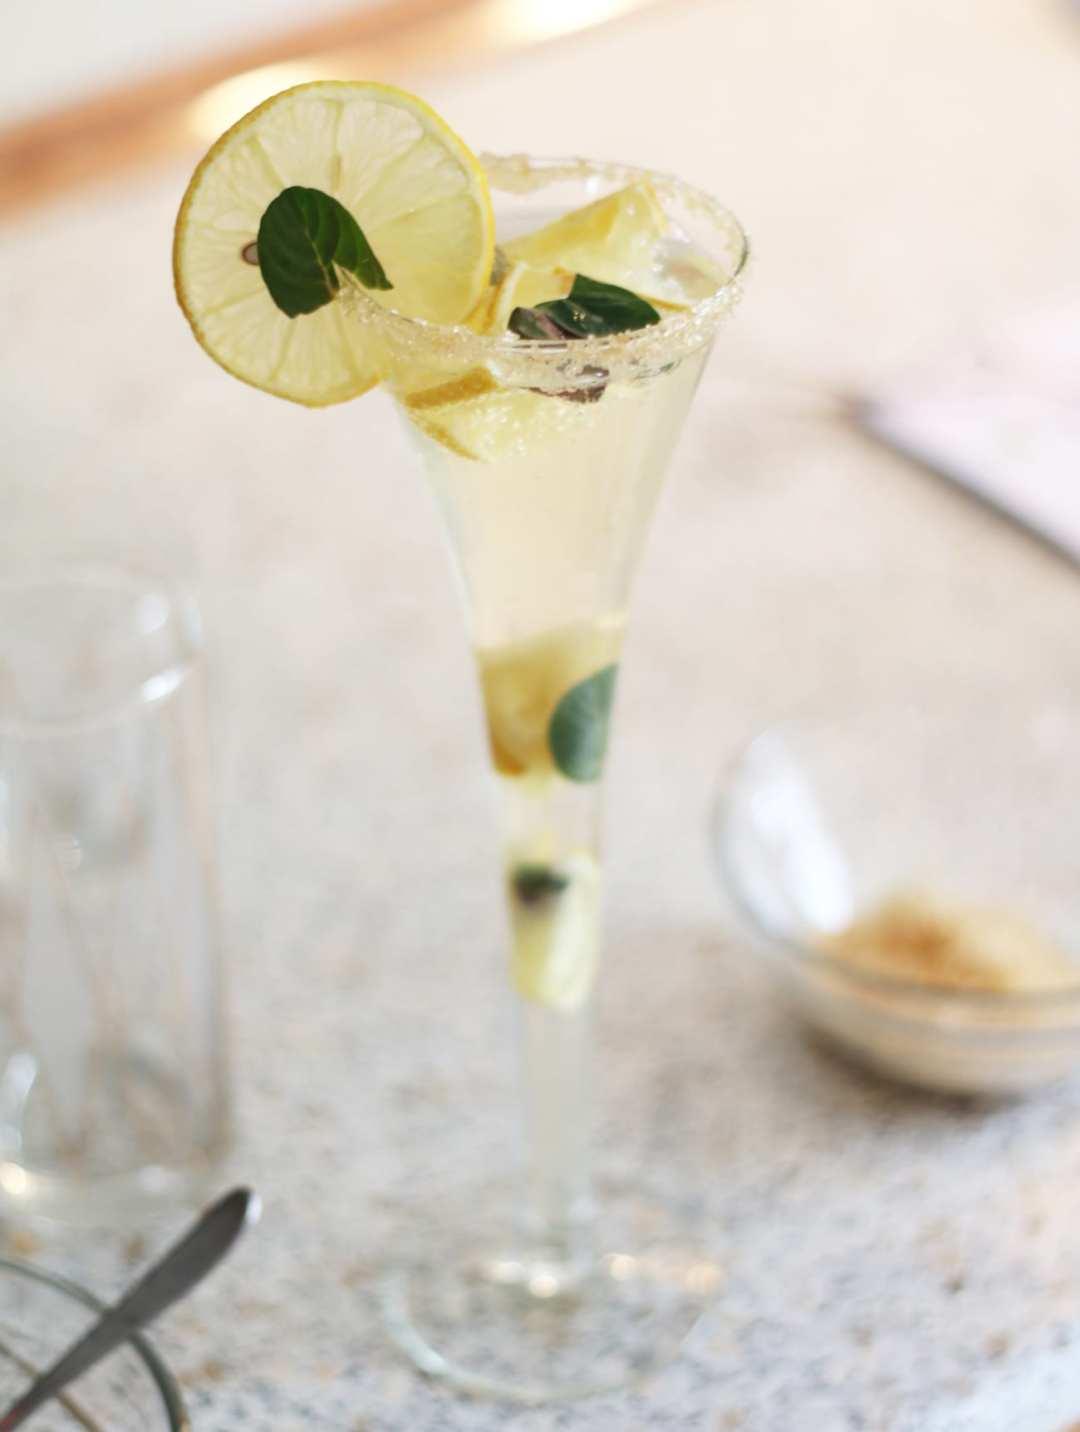 yo sirop roxi rose reteta hugo cocktail romania lifestyle blog romania timisoara hugo recipe cum se face